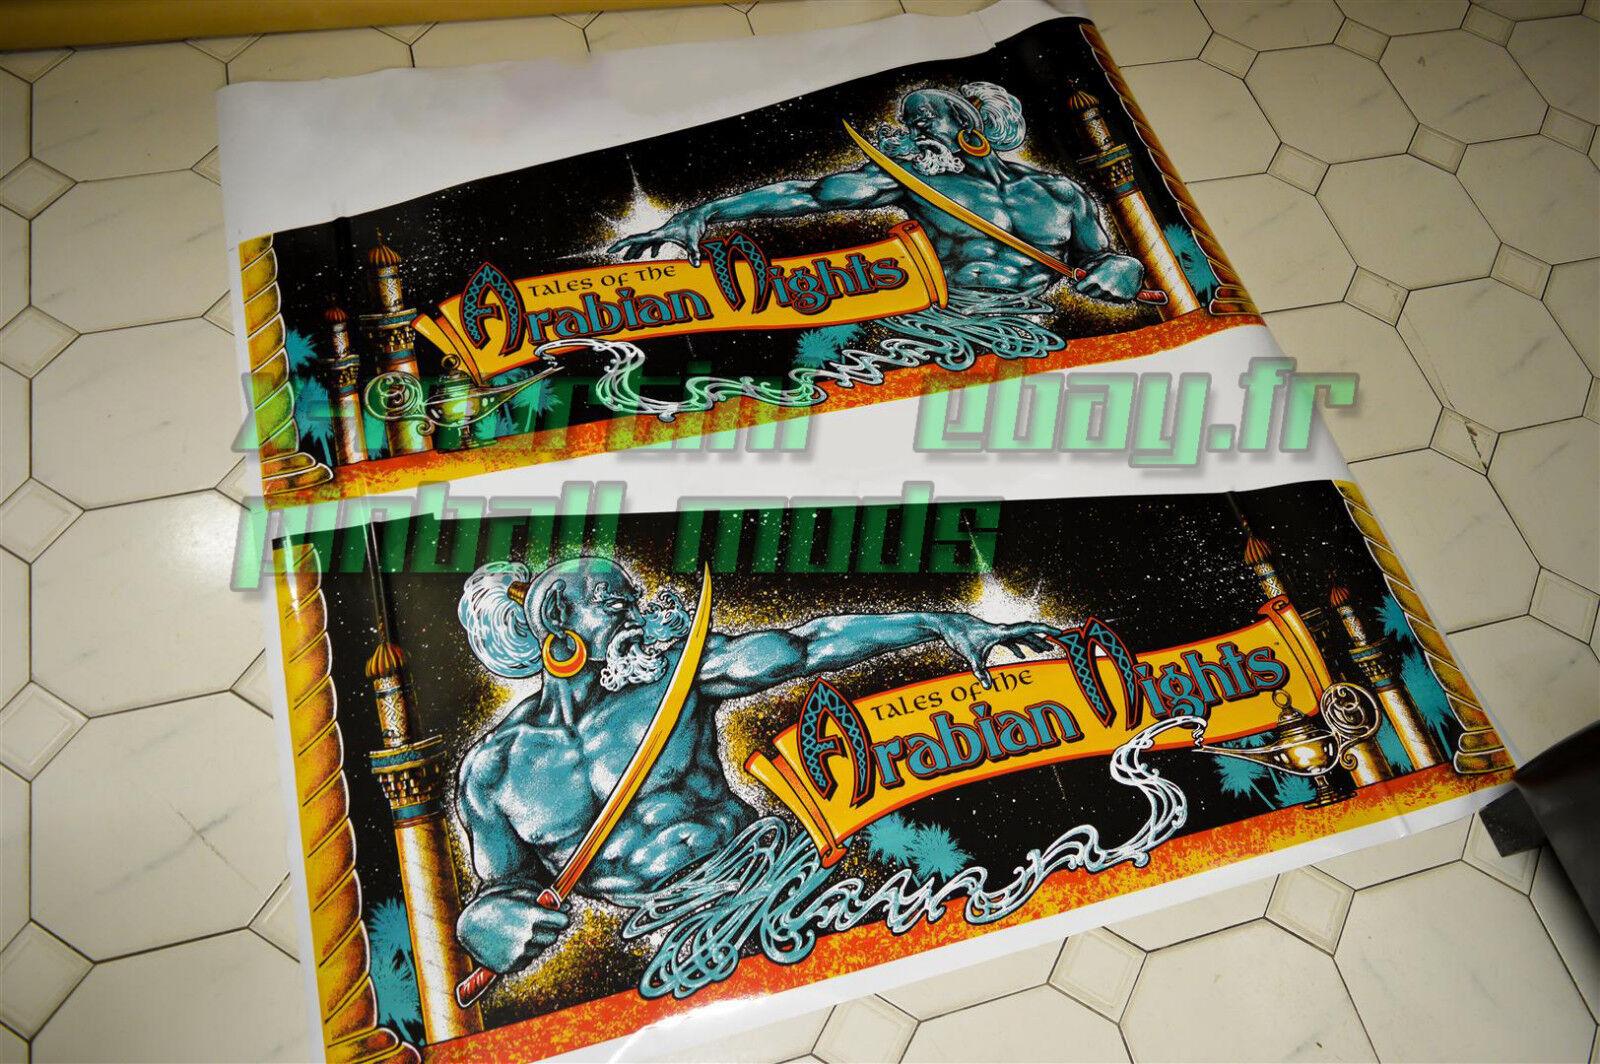 Tales of the Arabian Nights Decals  Pinball Decal Art Cabinet Williams  100% de contre-garantie authentique